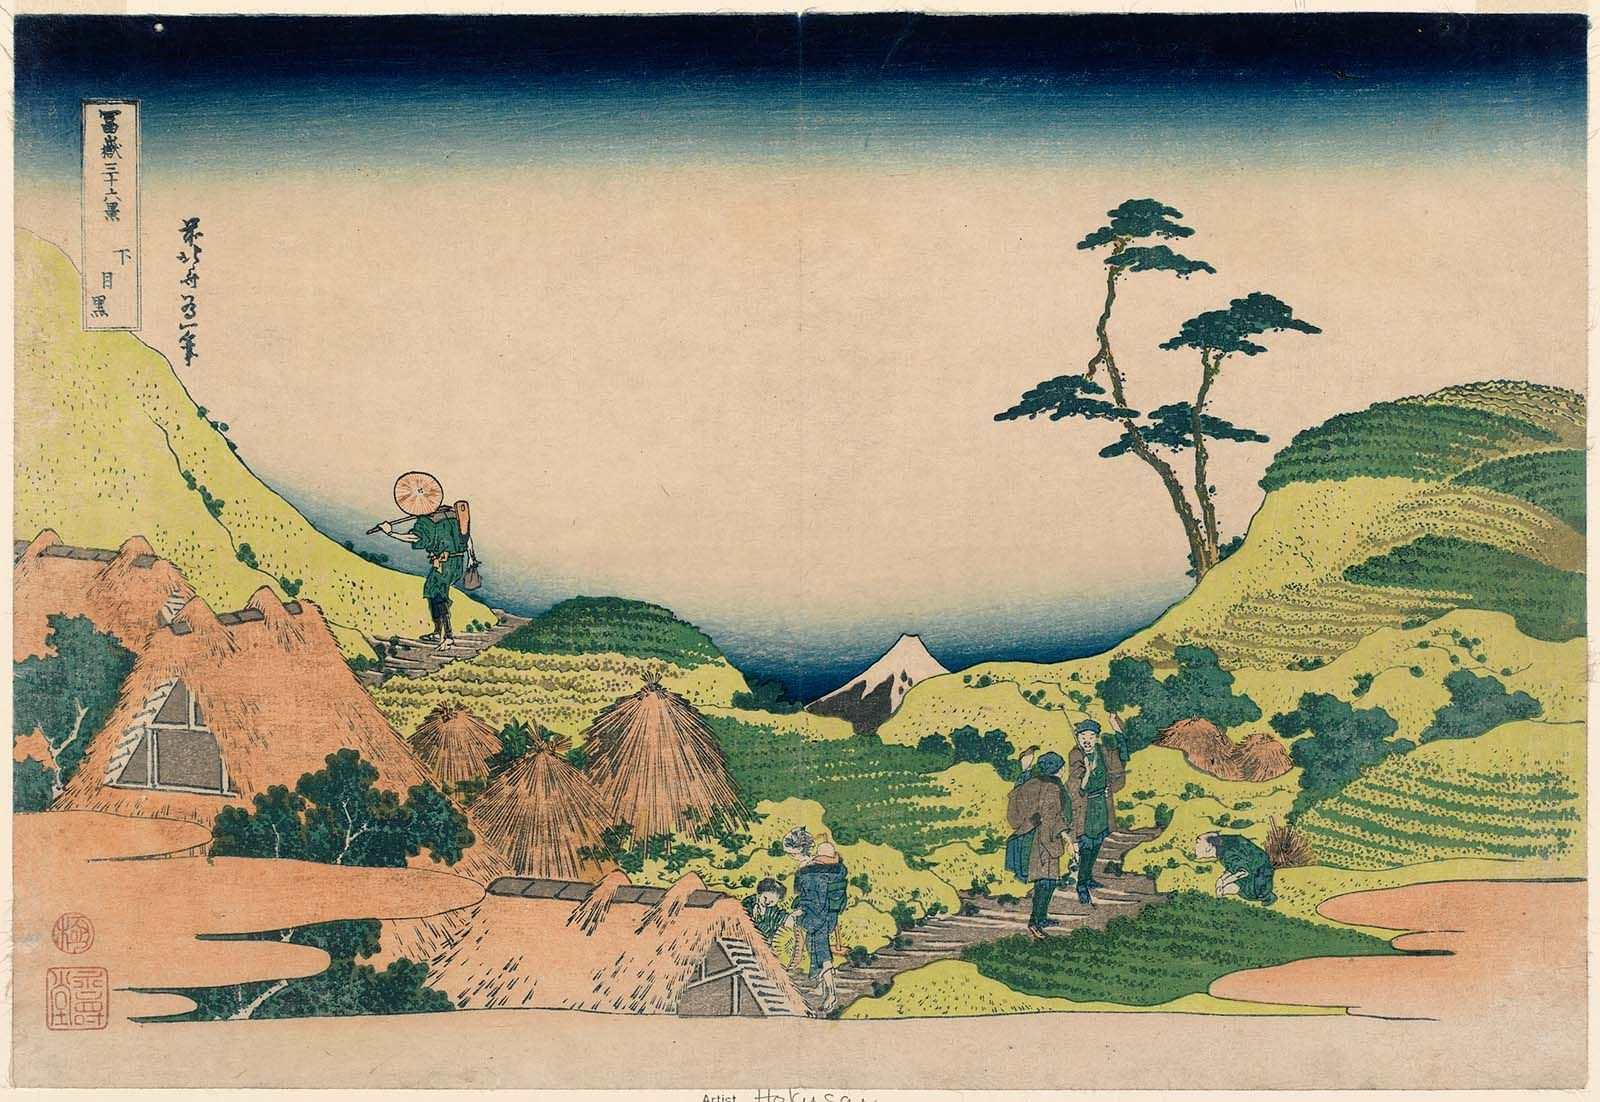 Lower Meguro Shimo Meguro From The Series Thirty Six Views Of Mount Fuji Fugaku Sanjûrokkei Katsushika Hokusai Landscape Prints Japan Landscape